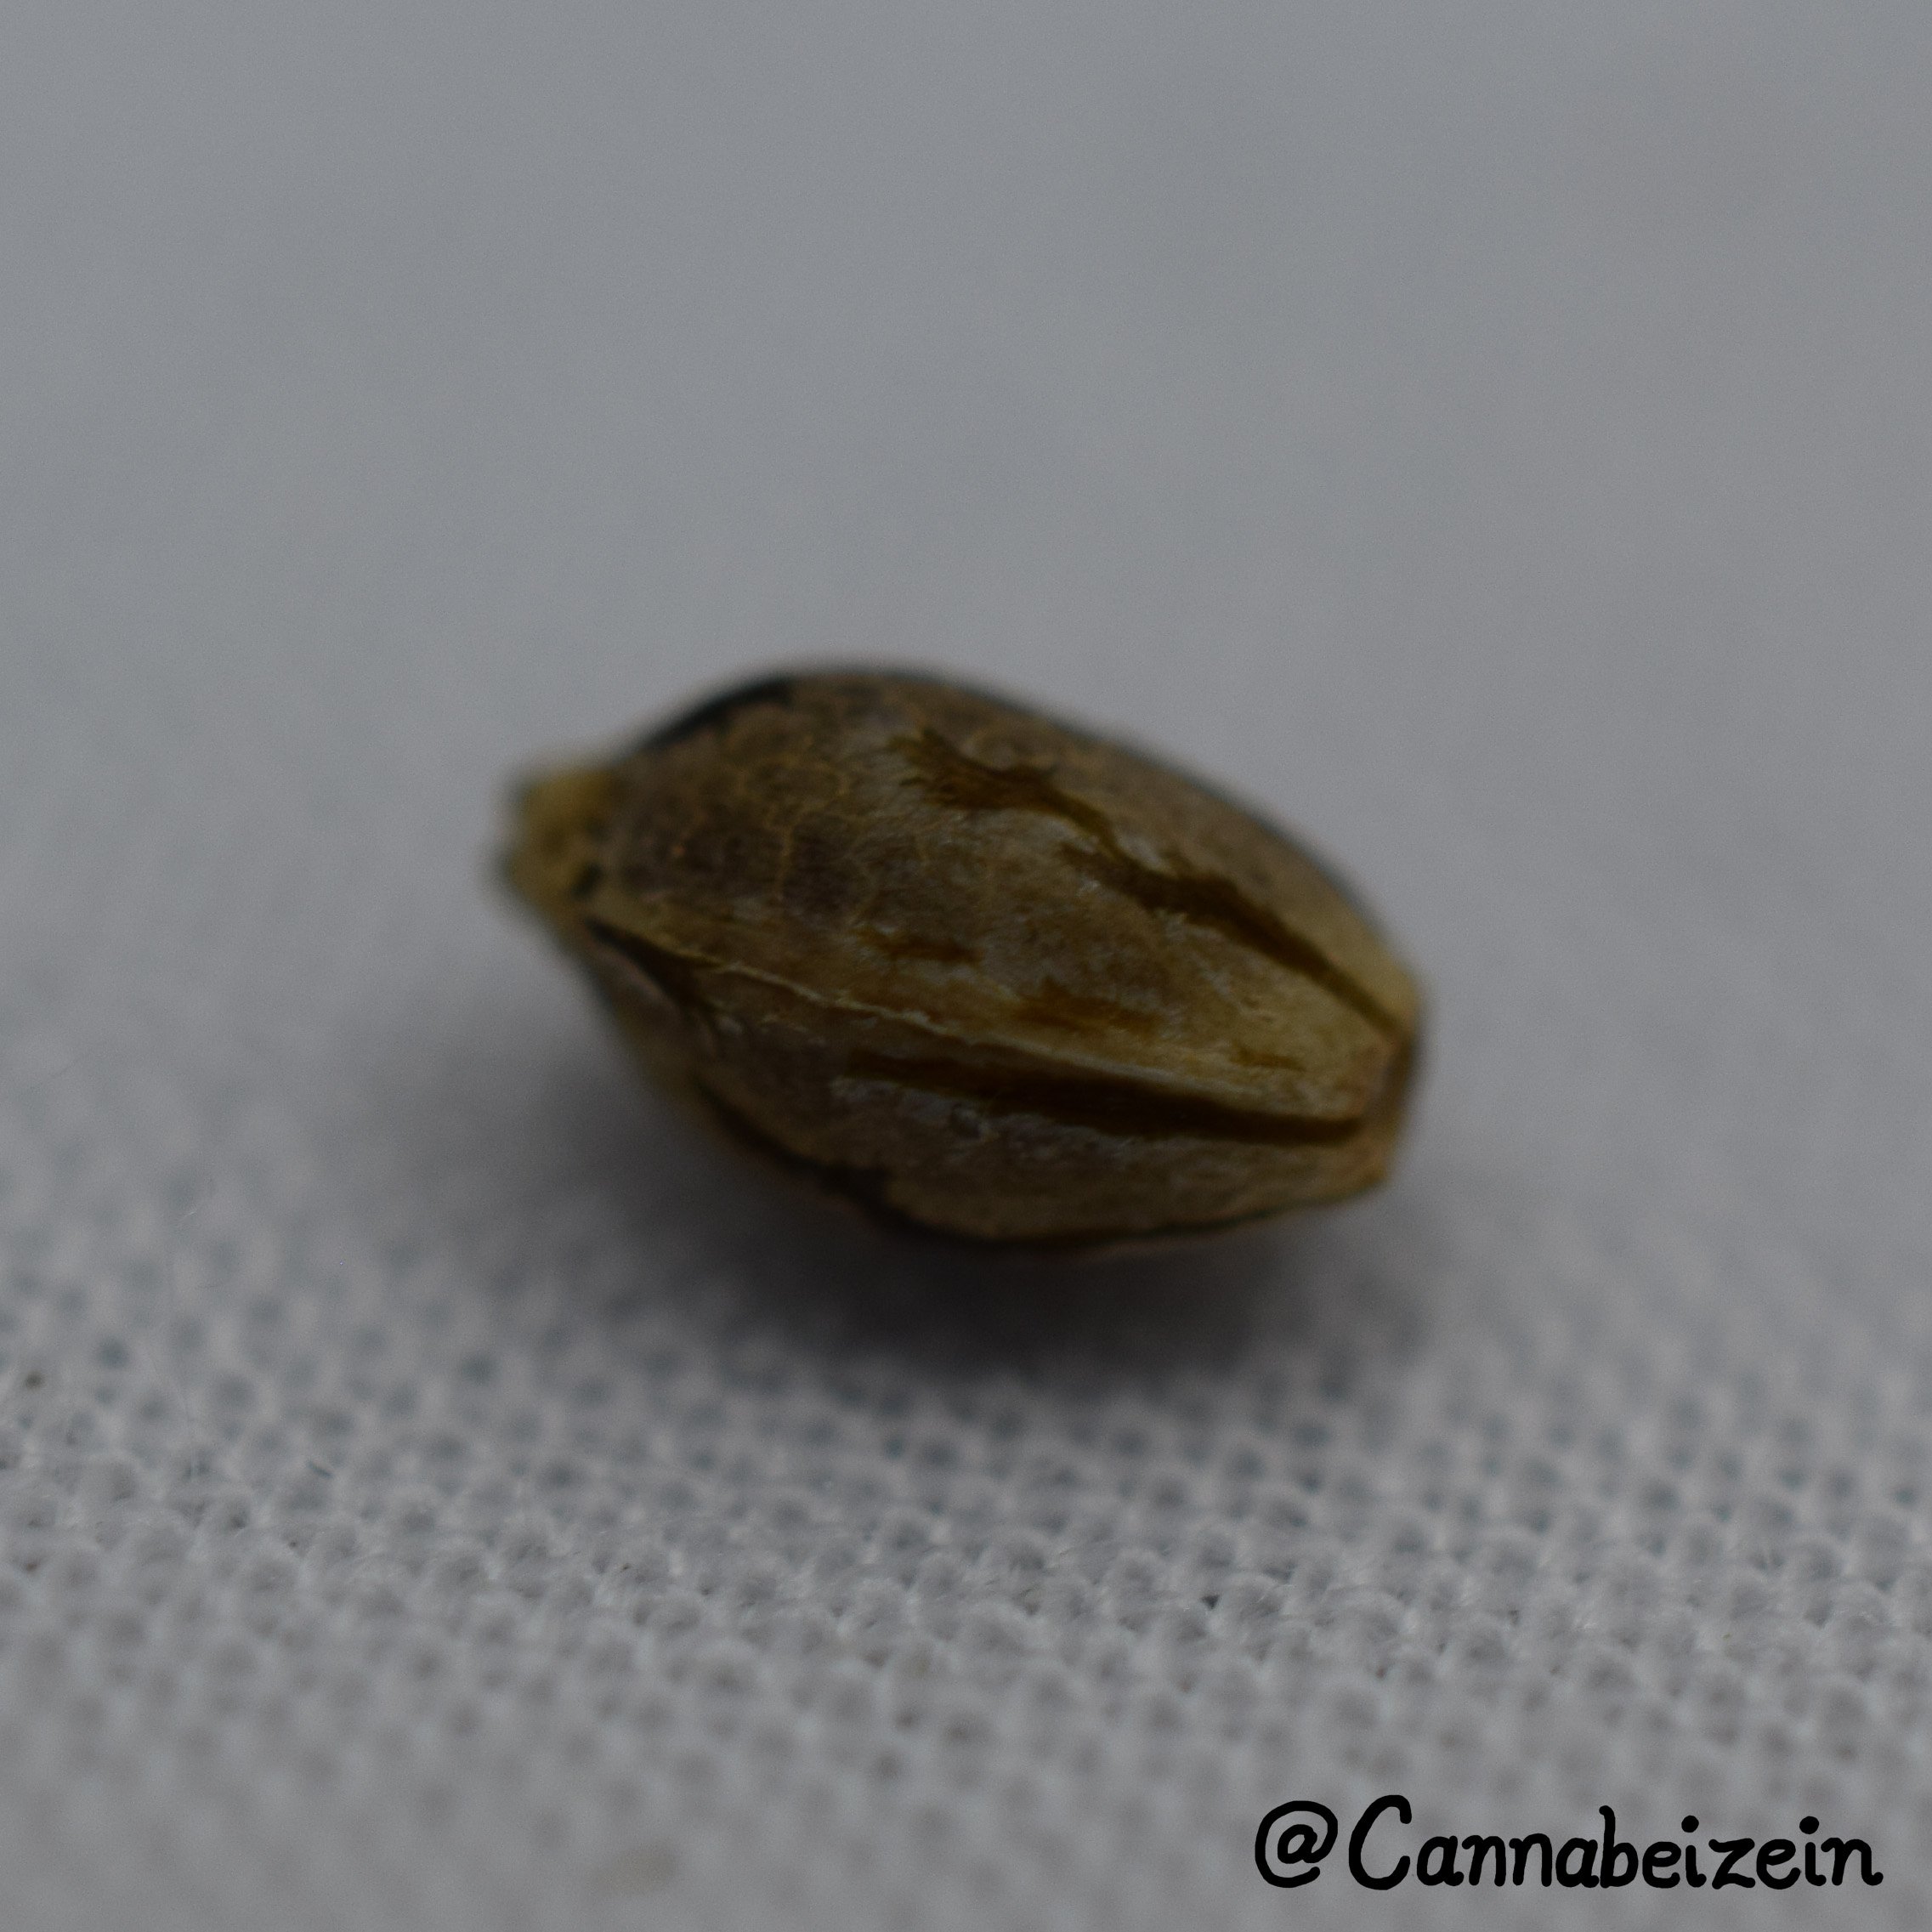 Cannabeizein 0219 - Mystery Mix Seeds - DSC_0804 copy.jpg